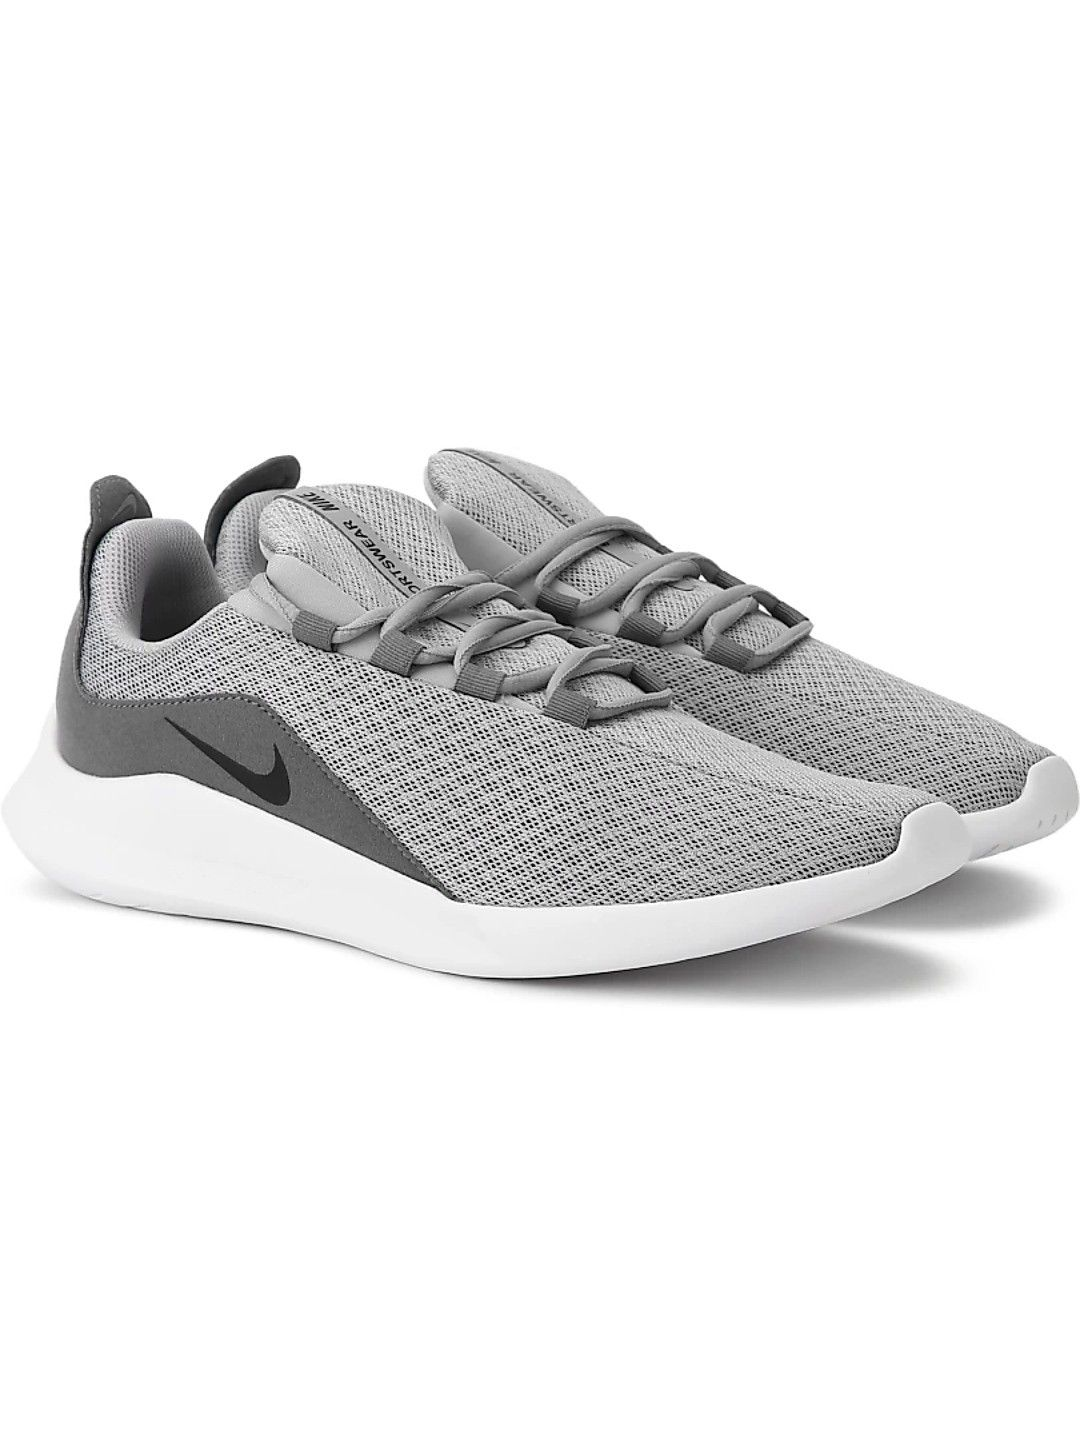 nike shoes grey colour